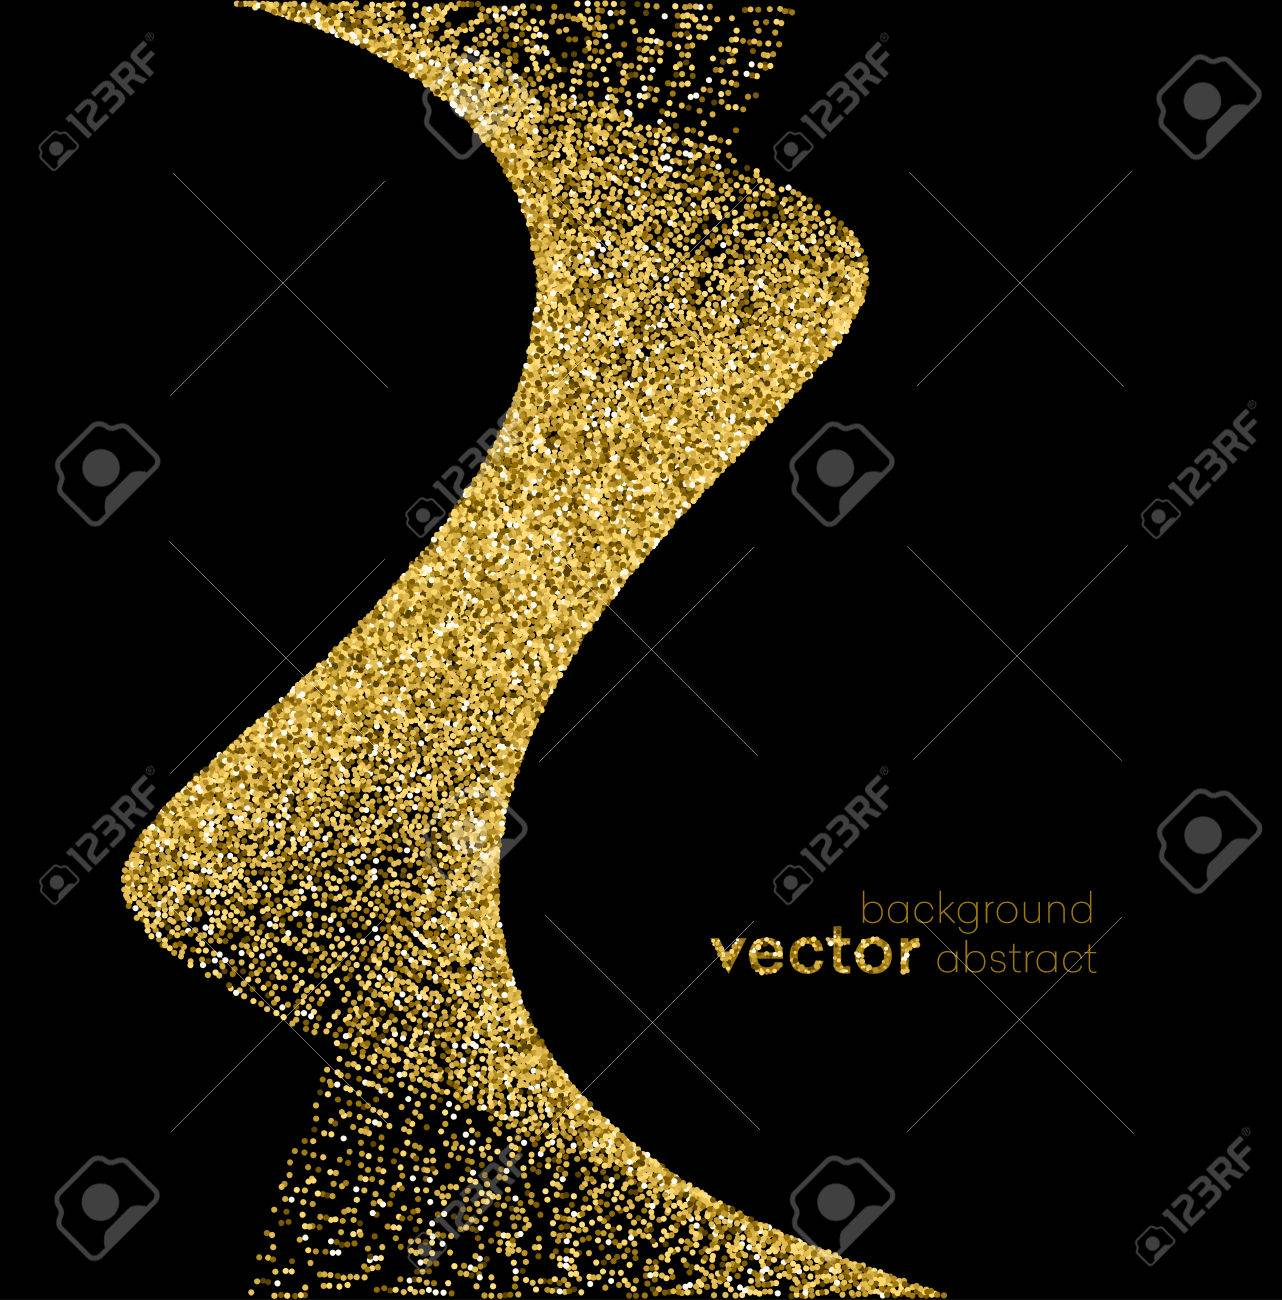 Gold sparkles on white background. Gold glitter background. - 50904835